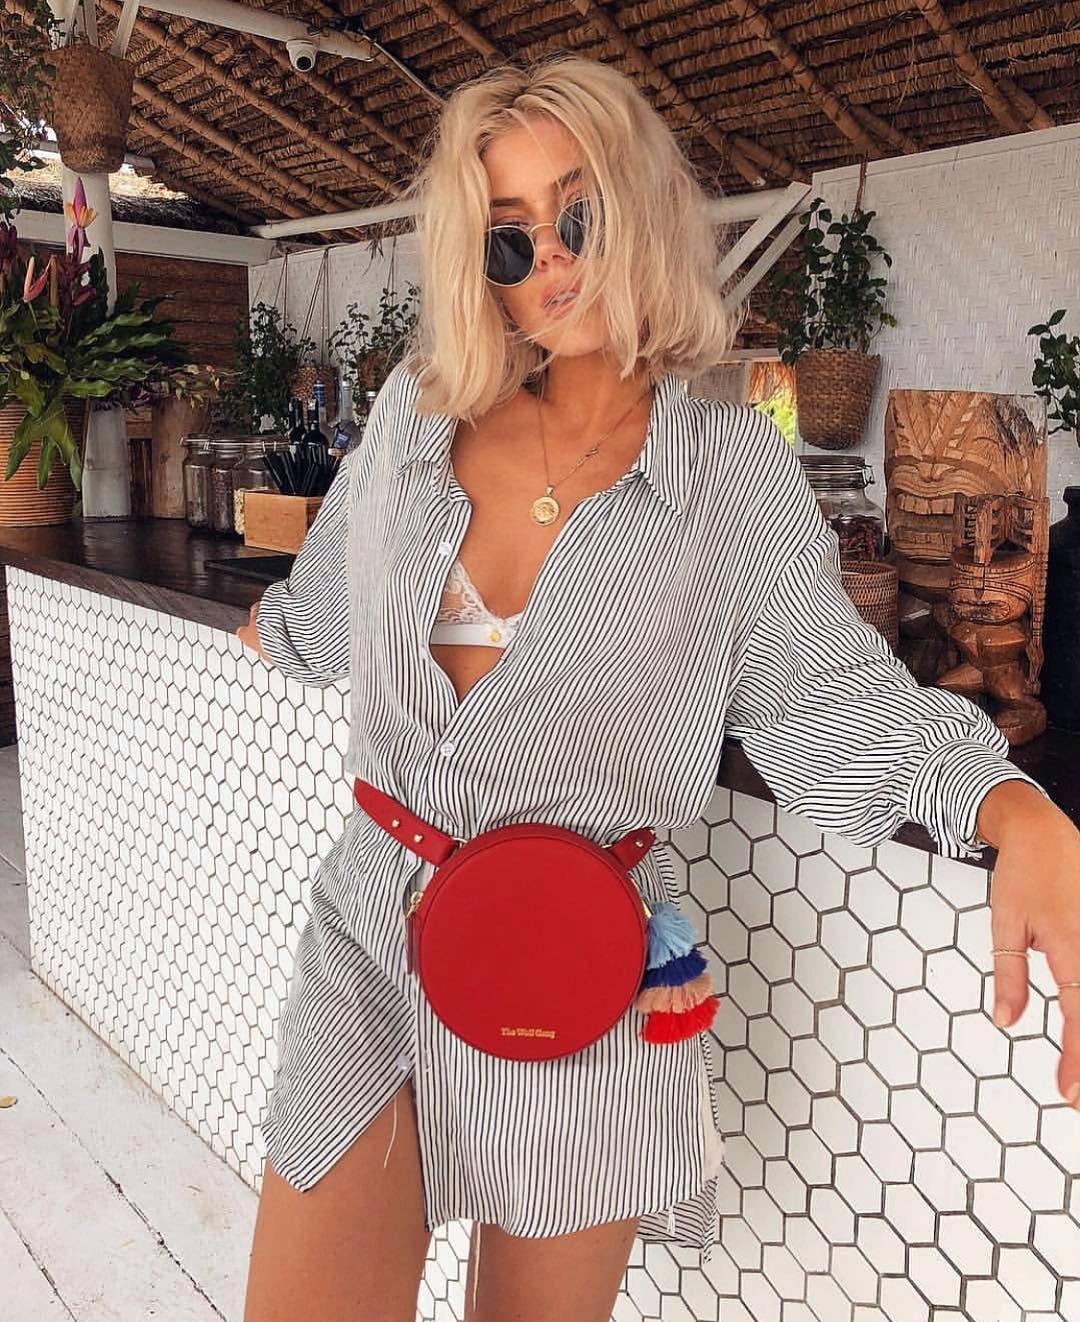 Black-White Pinstripe Shirtdress For Summer Vacation 2021